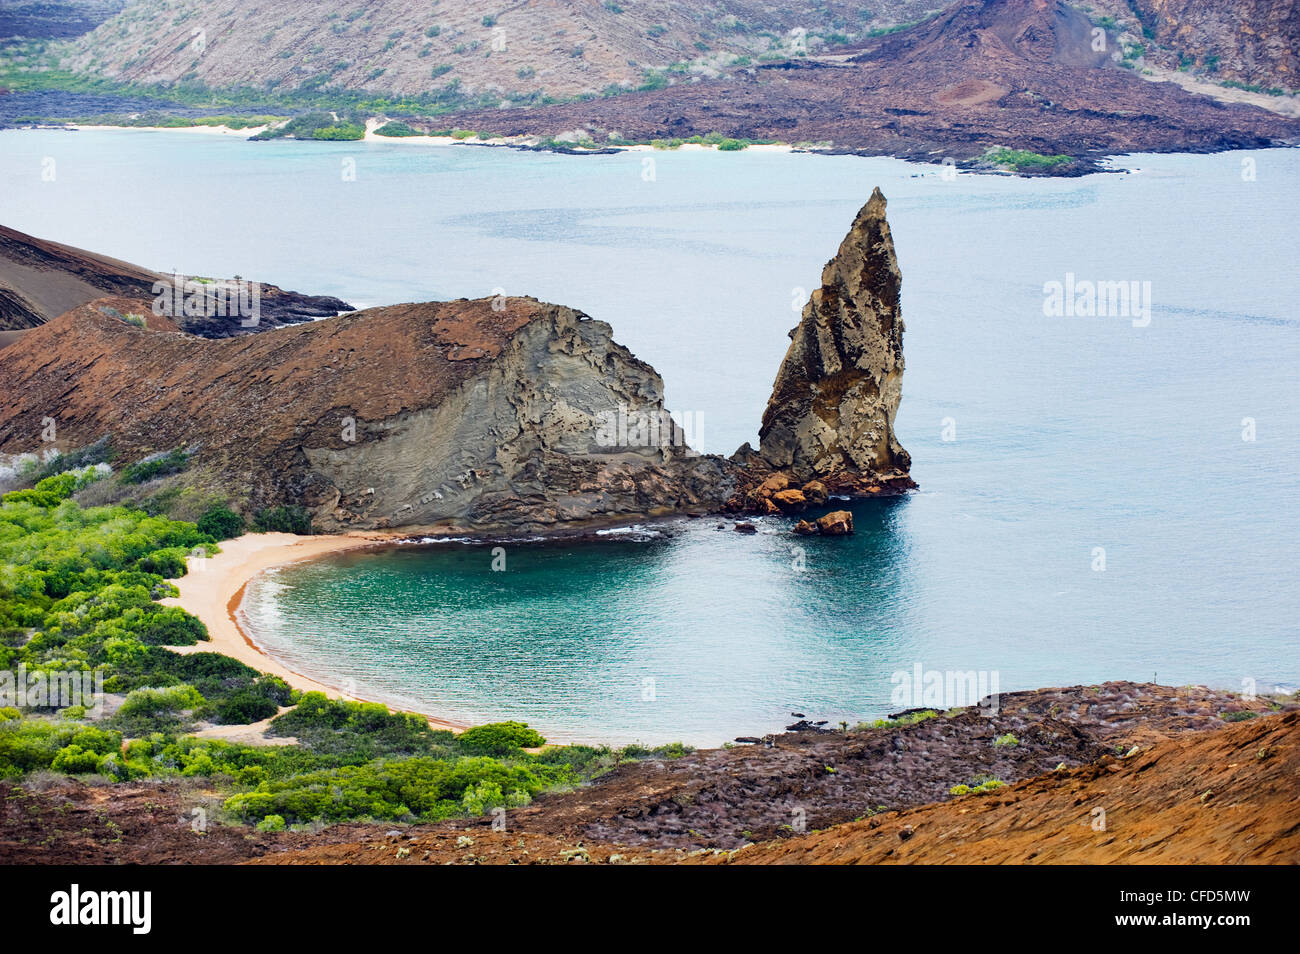 Pinnacle Rock, Isla Bartholome, Galapagos Islands, UNESCO World Heritage Site, Ecuador, South America - Stock Image